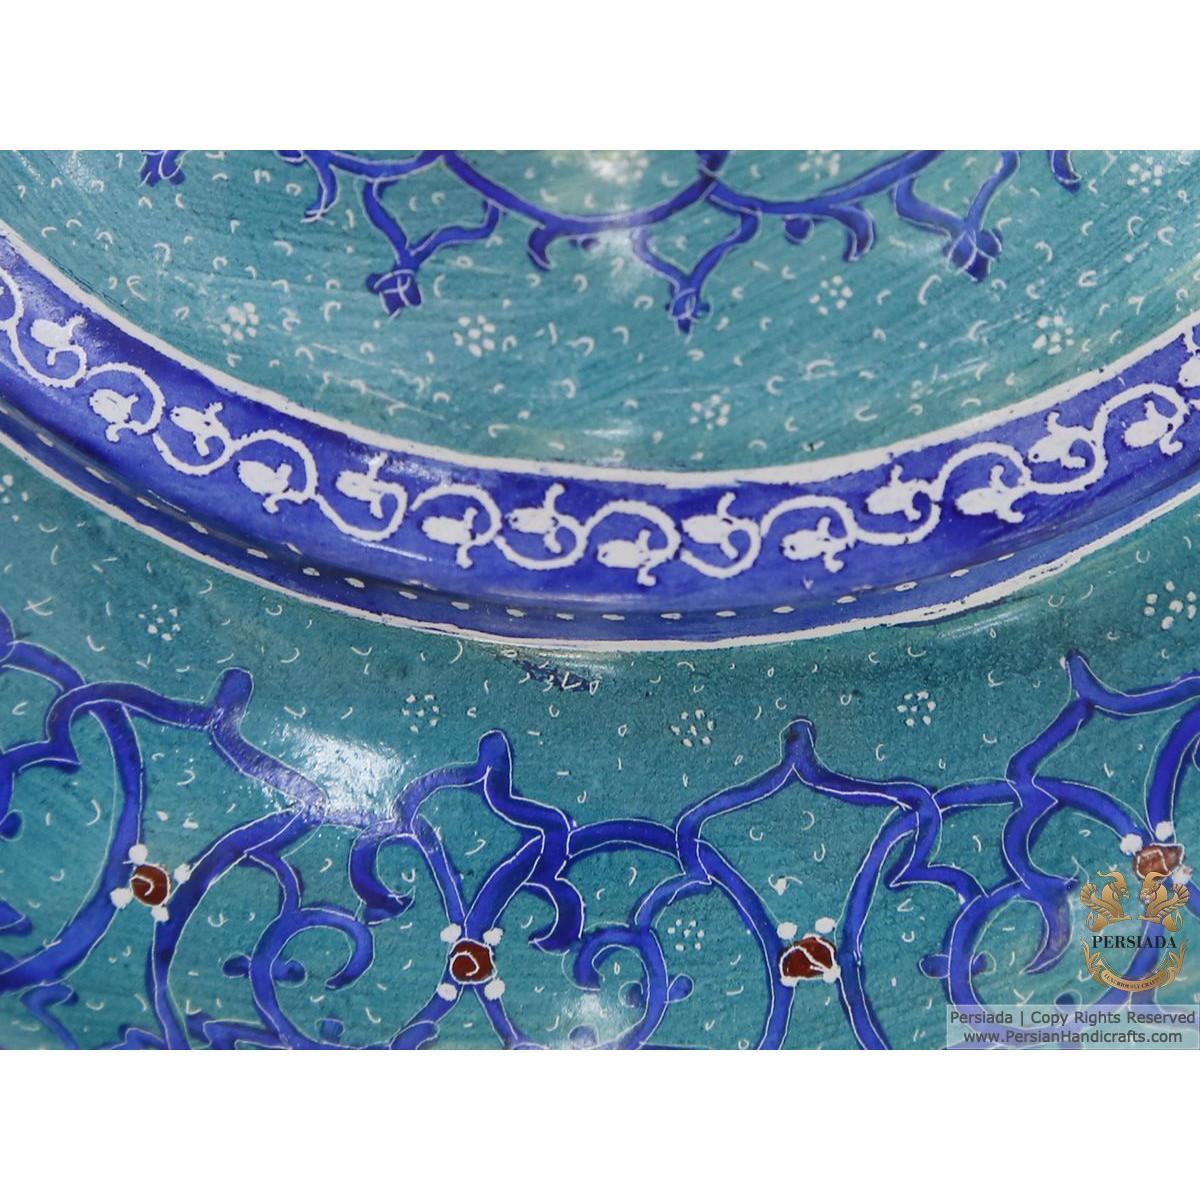 Sugar Candy Pot - Enamel Minakari   PE4108-Persian Handicrafts